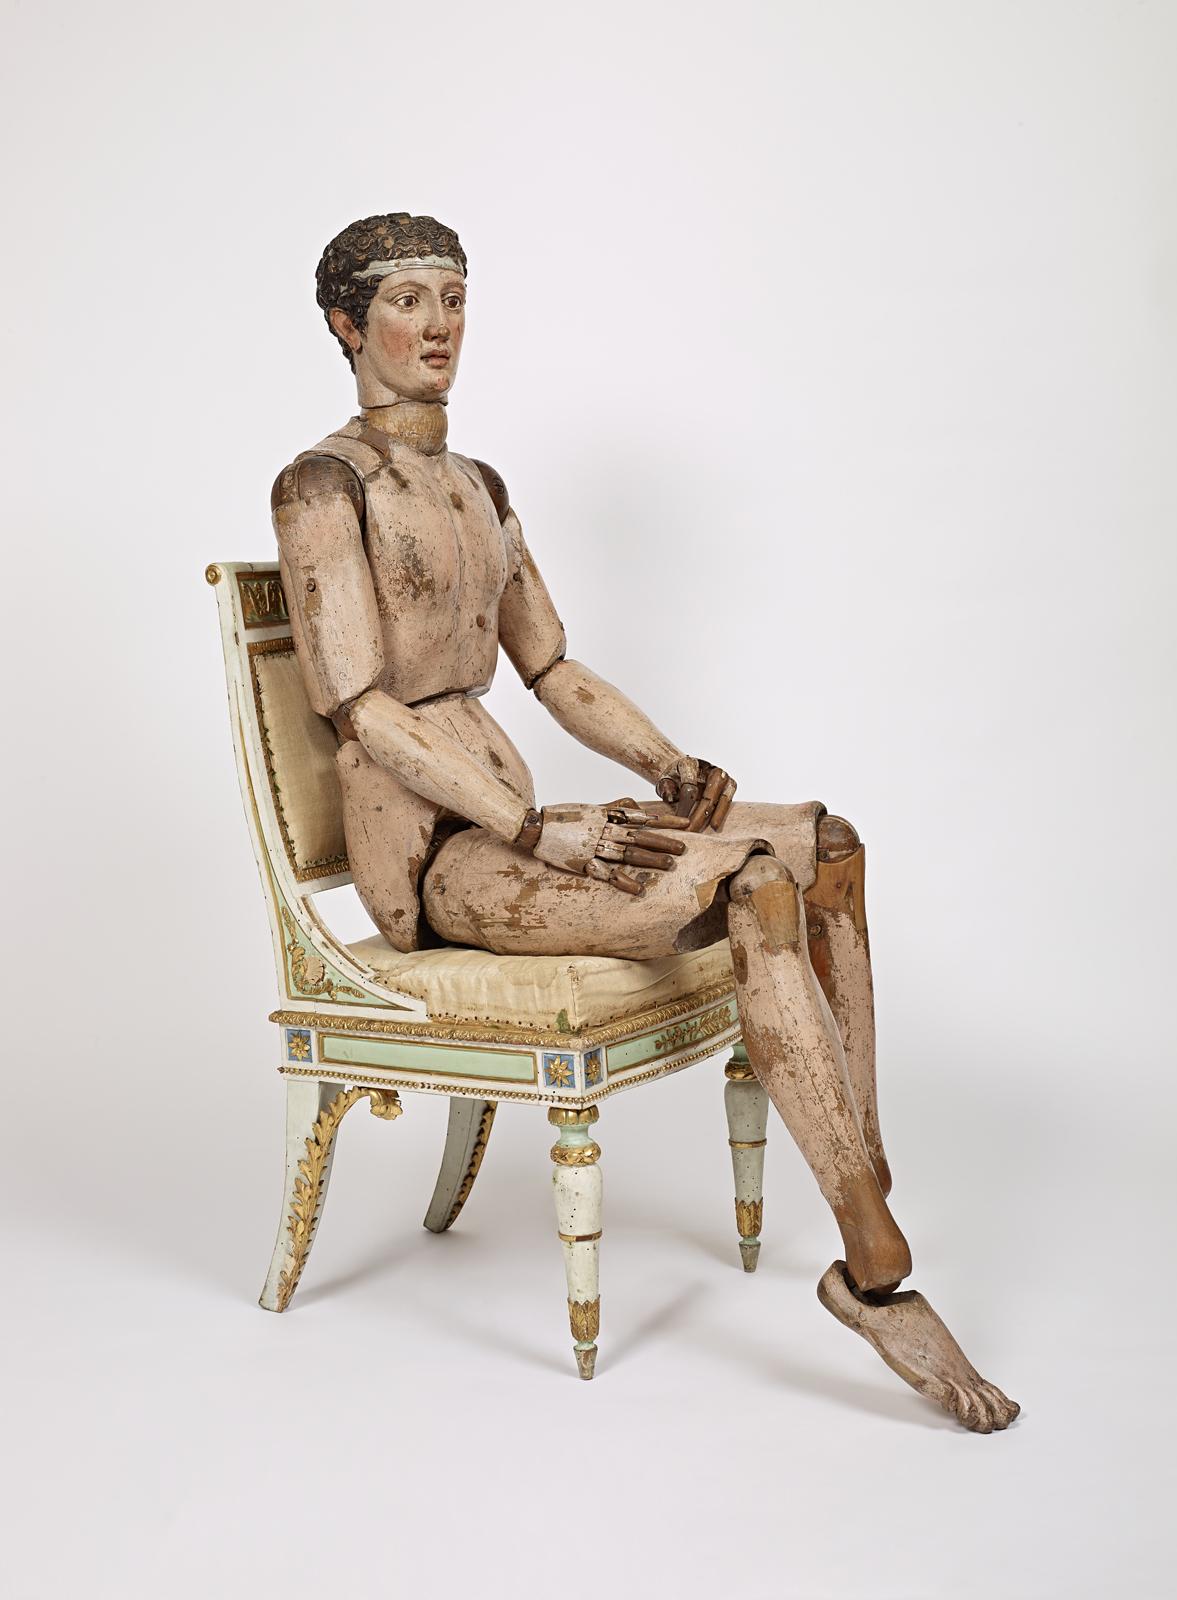 Mannequin néoclassique - Italie 1810 - Anonyme ) Comune di Bergamo Accademia Carrara